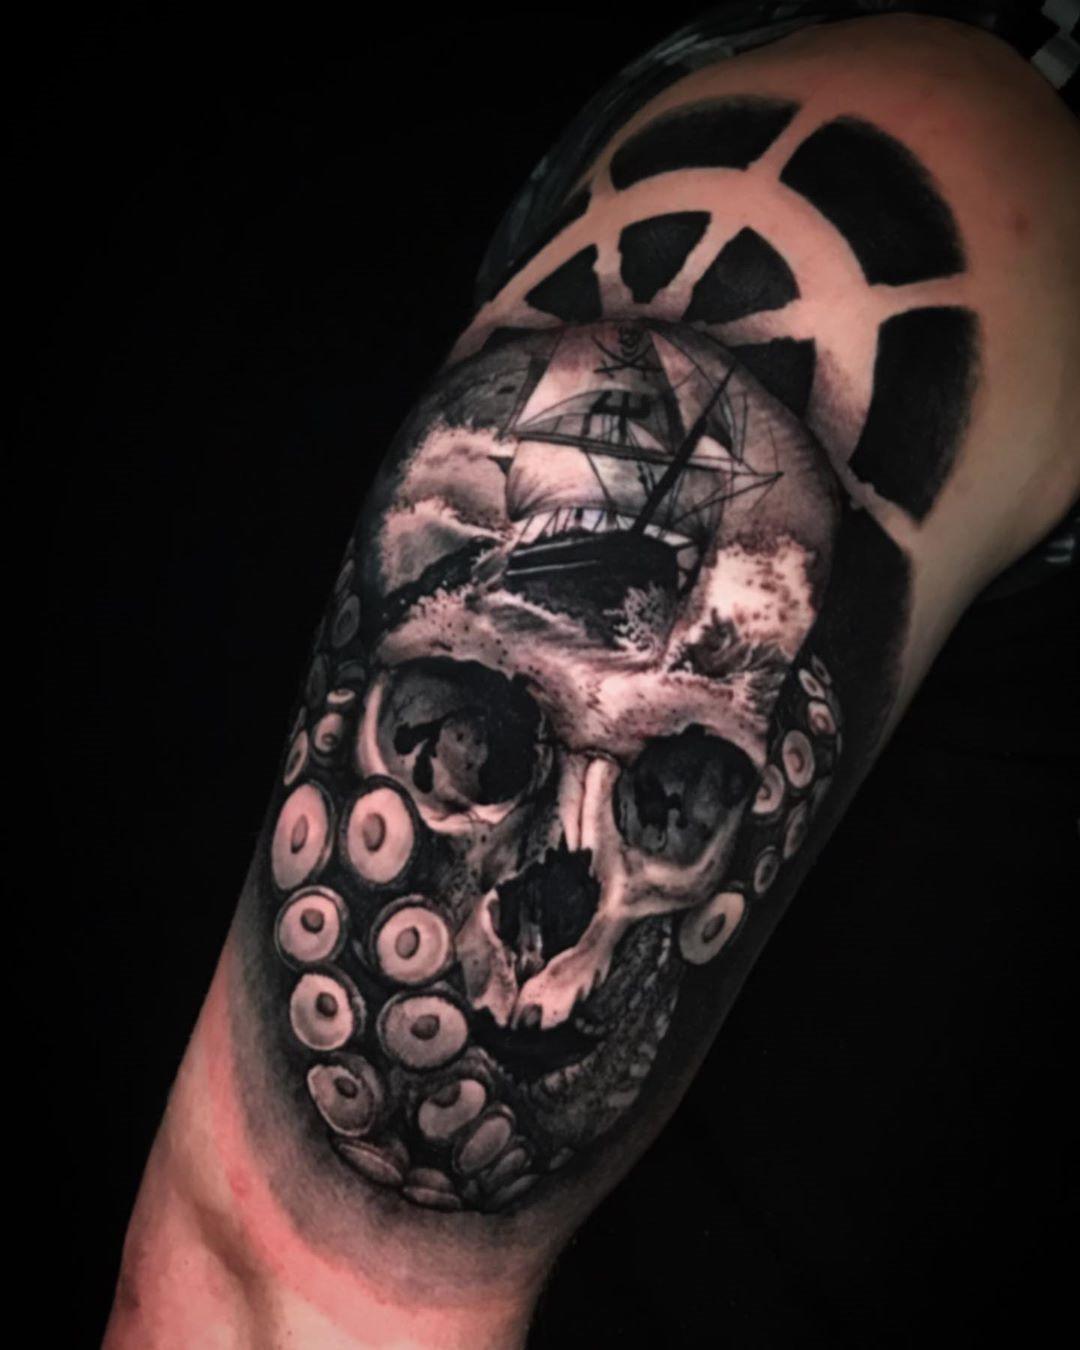 35 Watercolor Skull Tattoo Designs For Men and Women